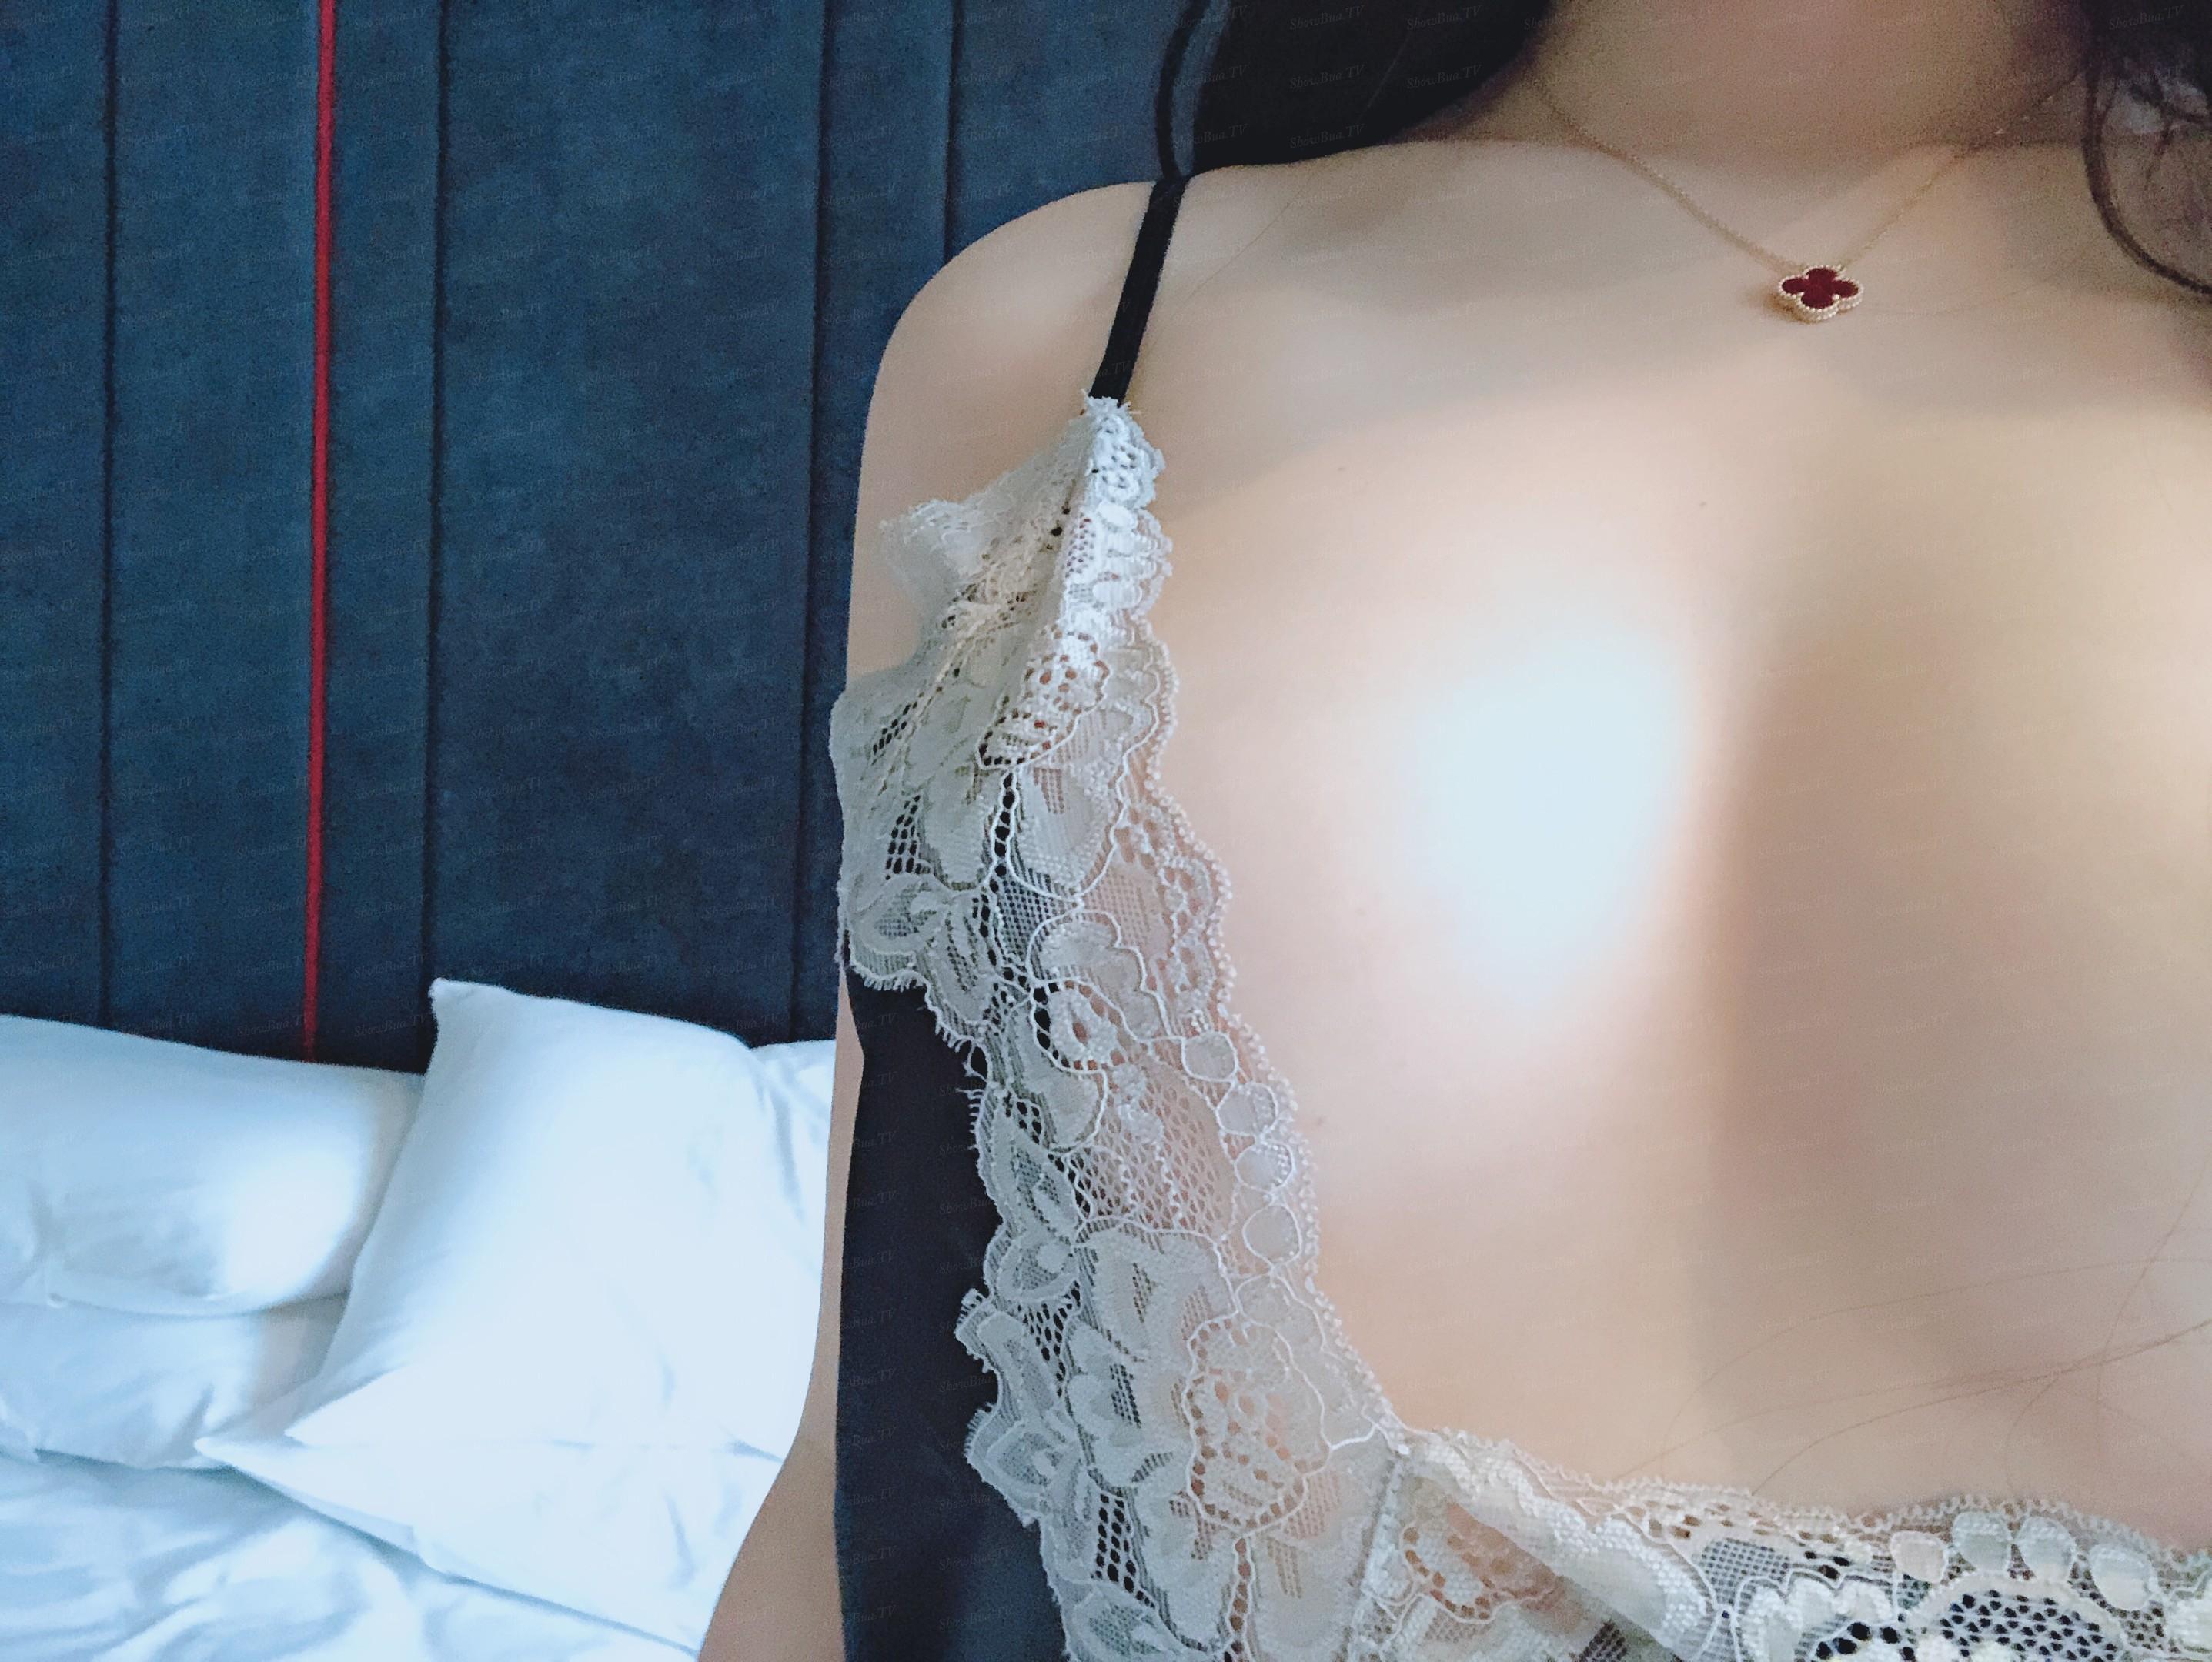 showbuatv-hotgirl-dang-dep-tha-hon-dam-vao-loat-anh-tu-suong-kich-thich-57